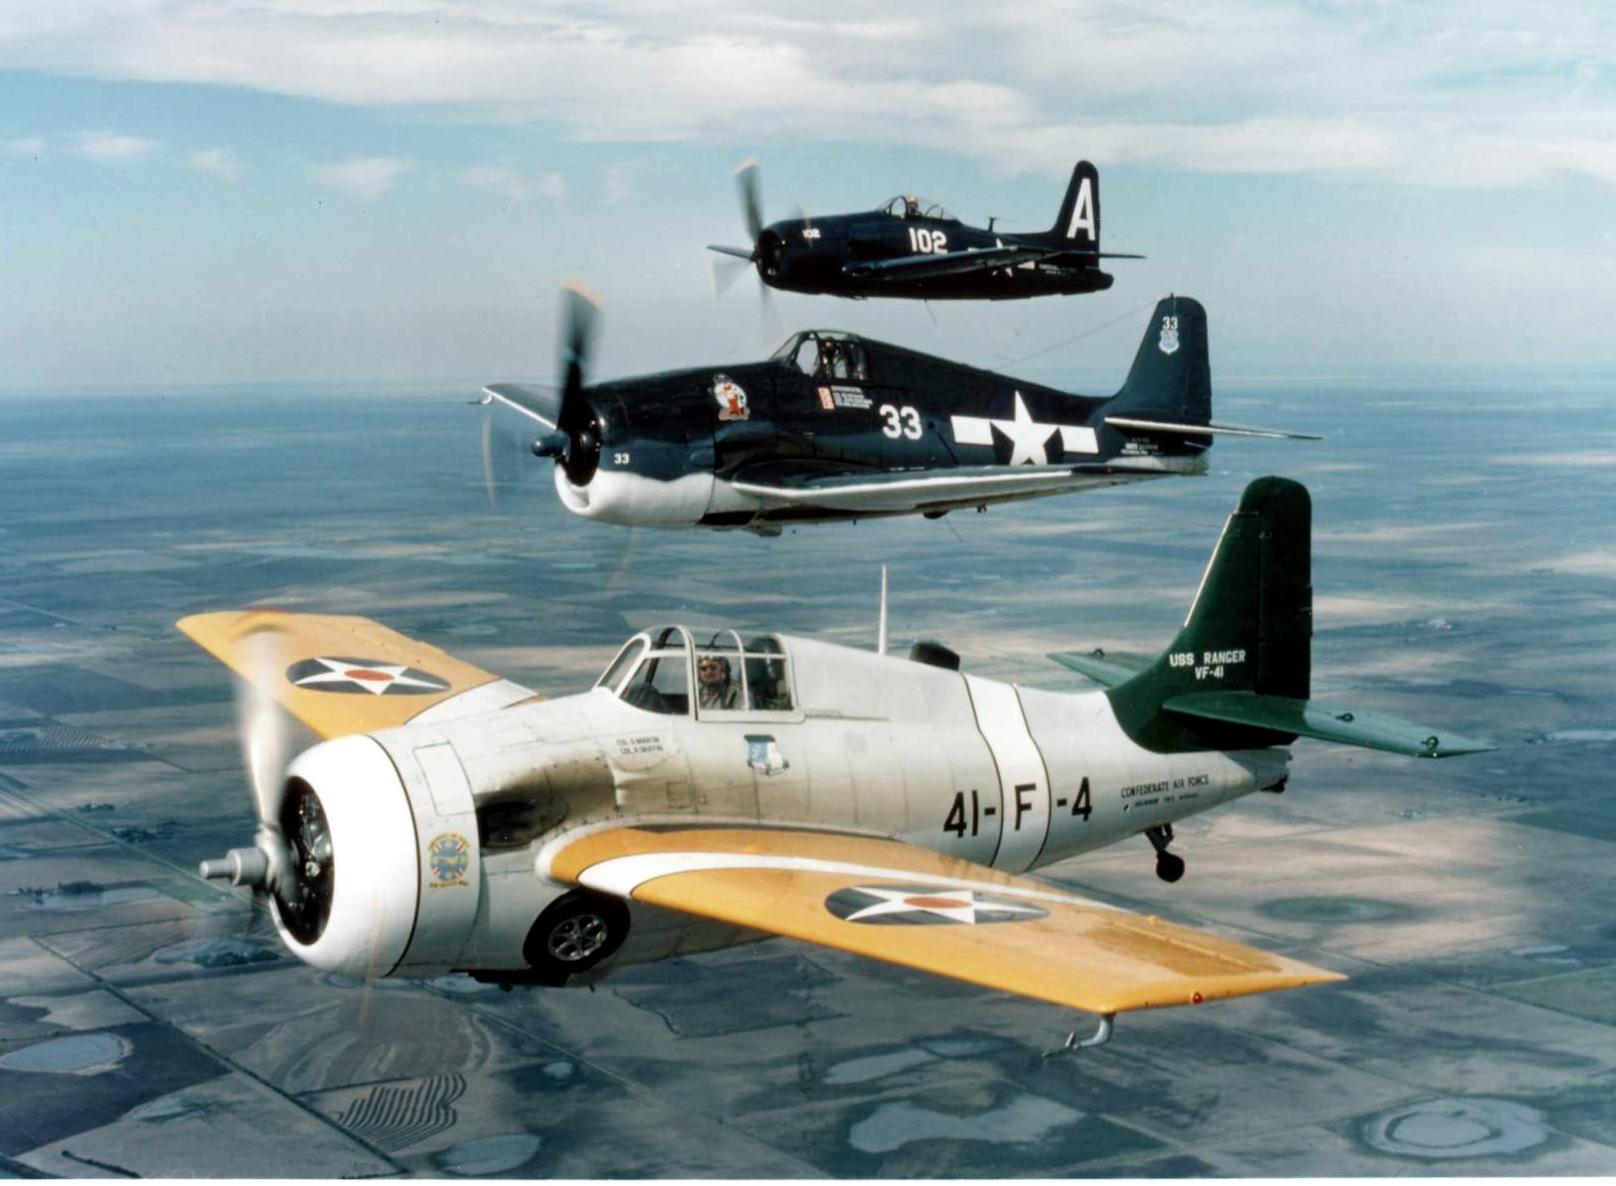 Wings Wallpaper Hd File Fm Wildcat F6f Hellcat And F8f Bearcat Warbirds In